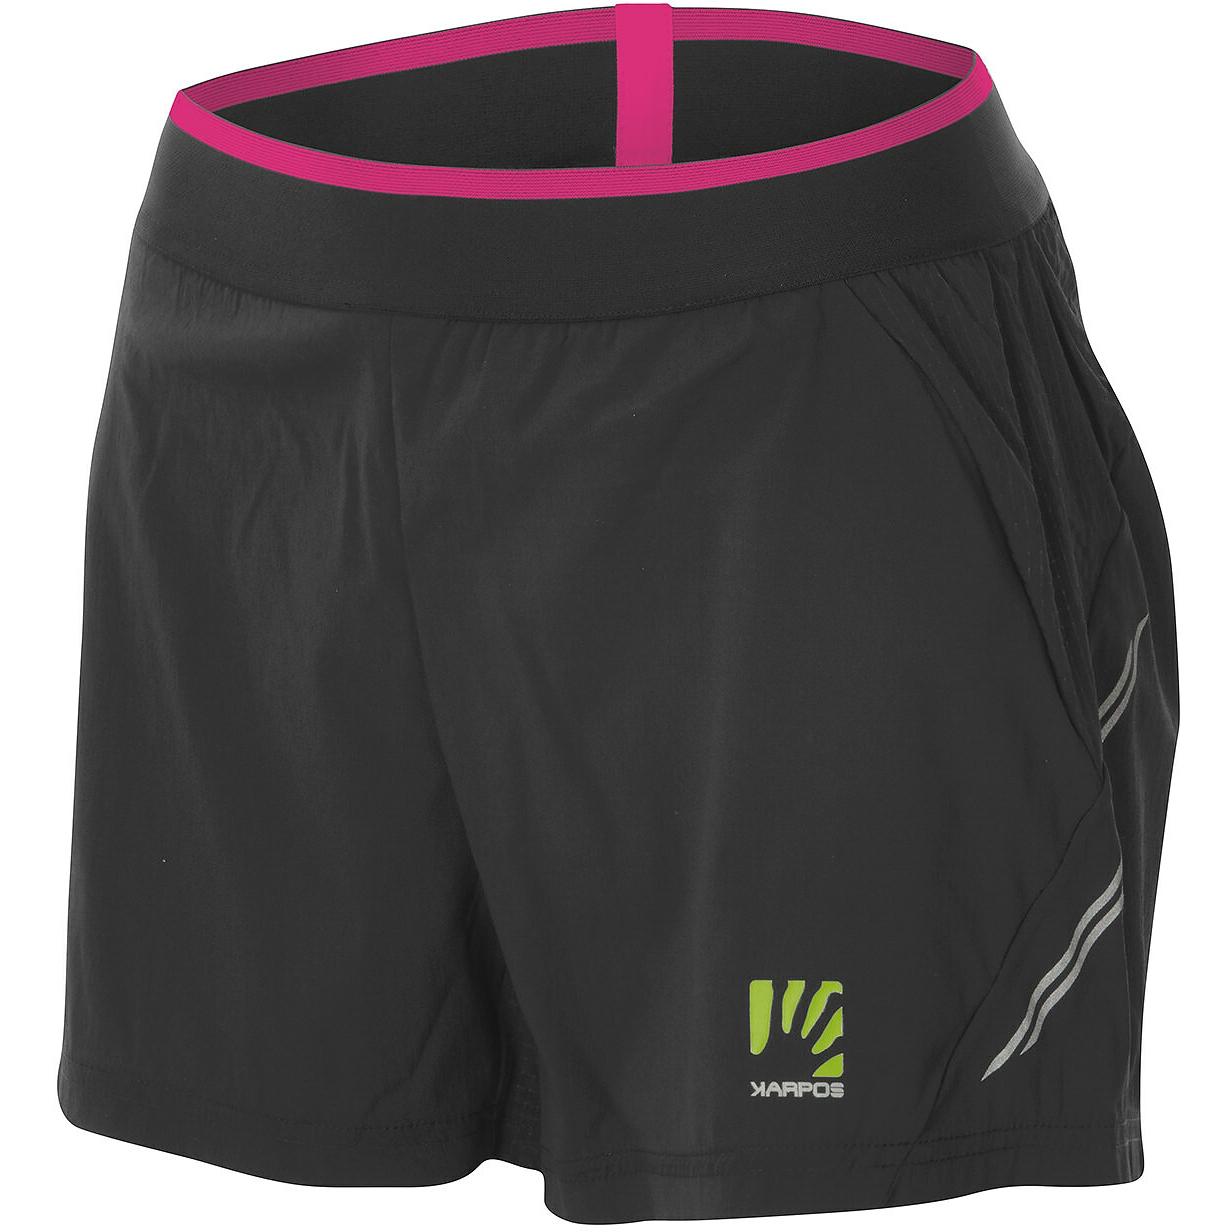 Karpos Fast Evo Damen Shorts - black